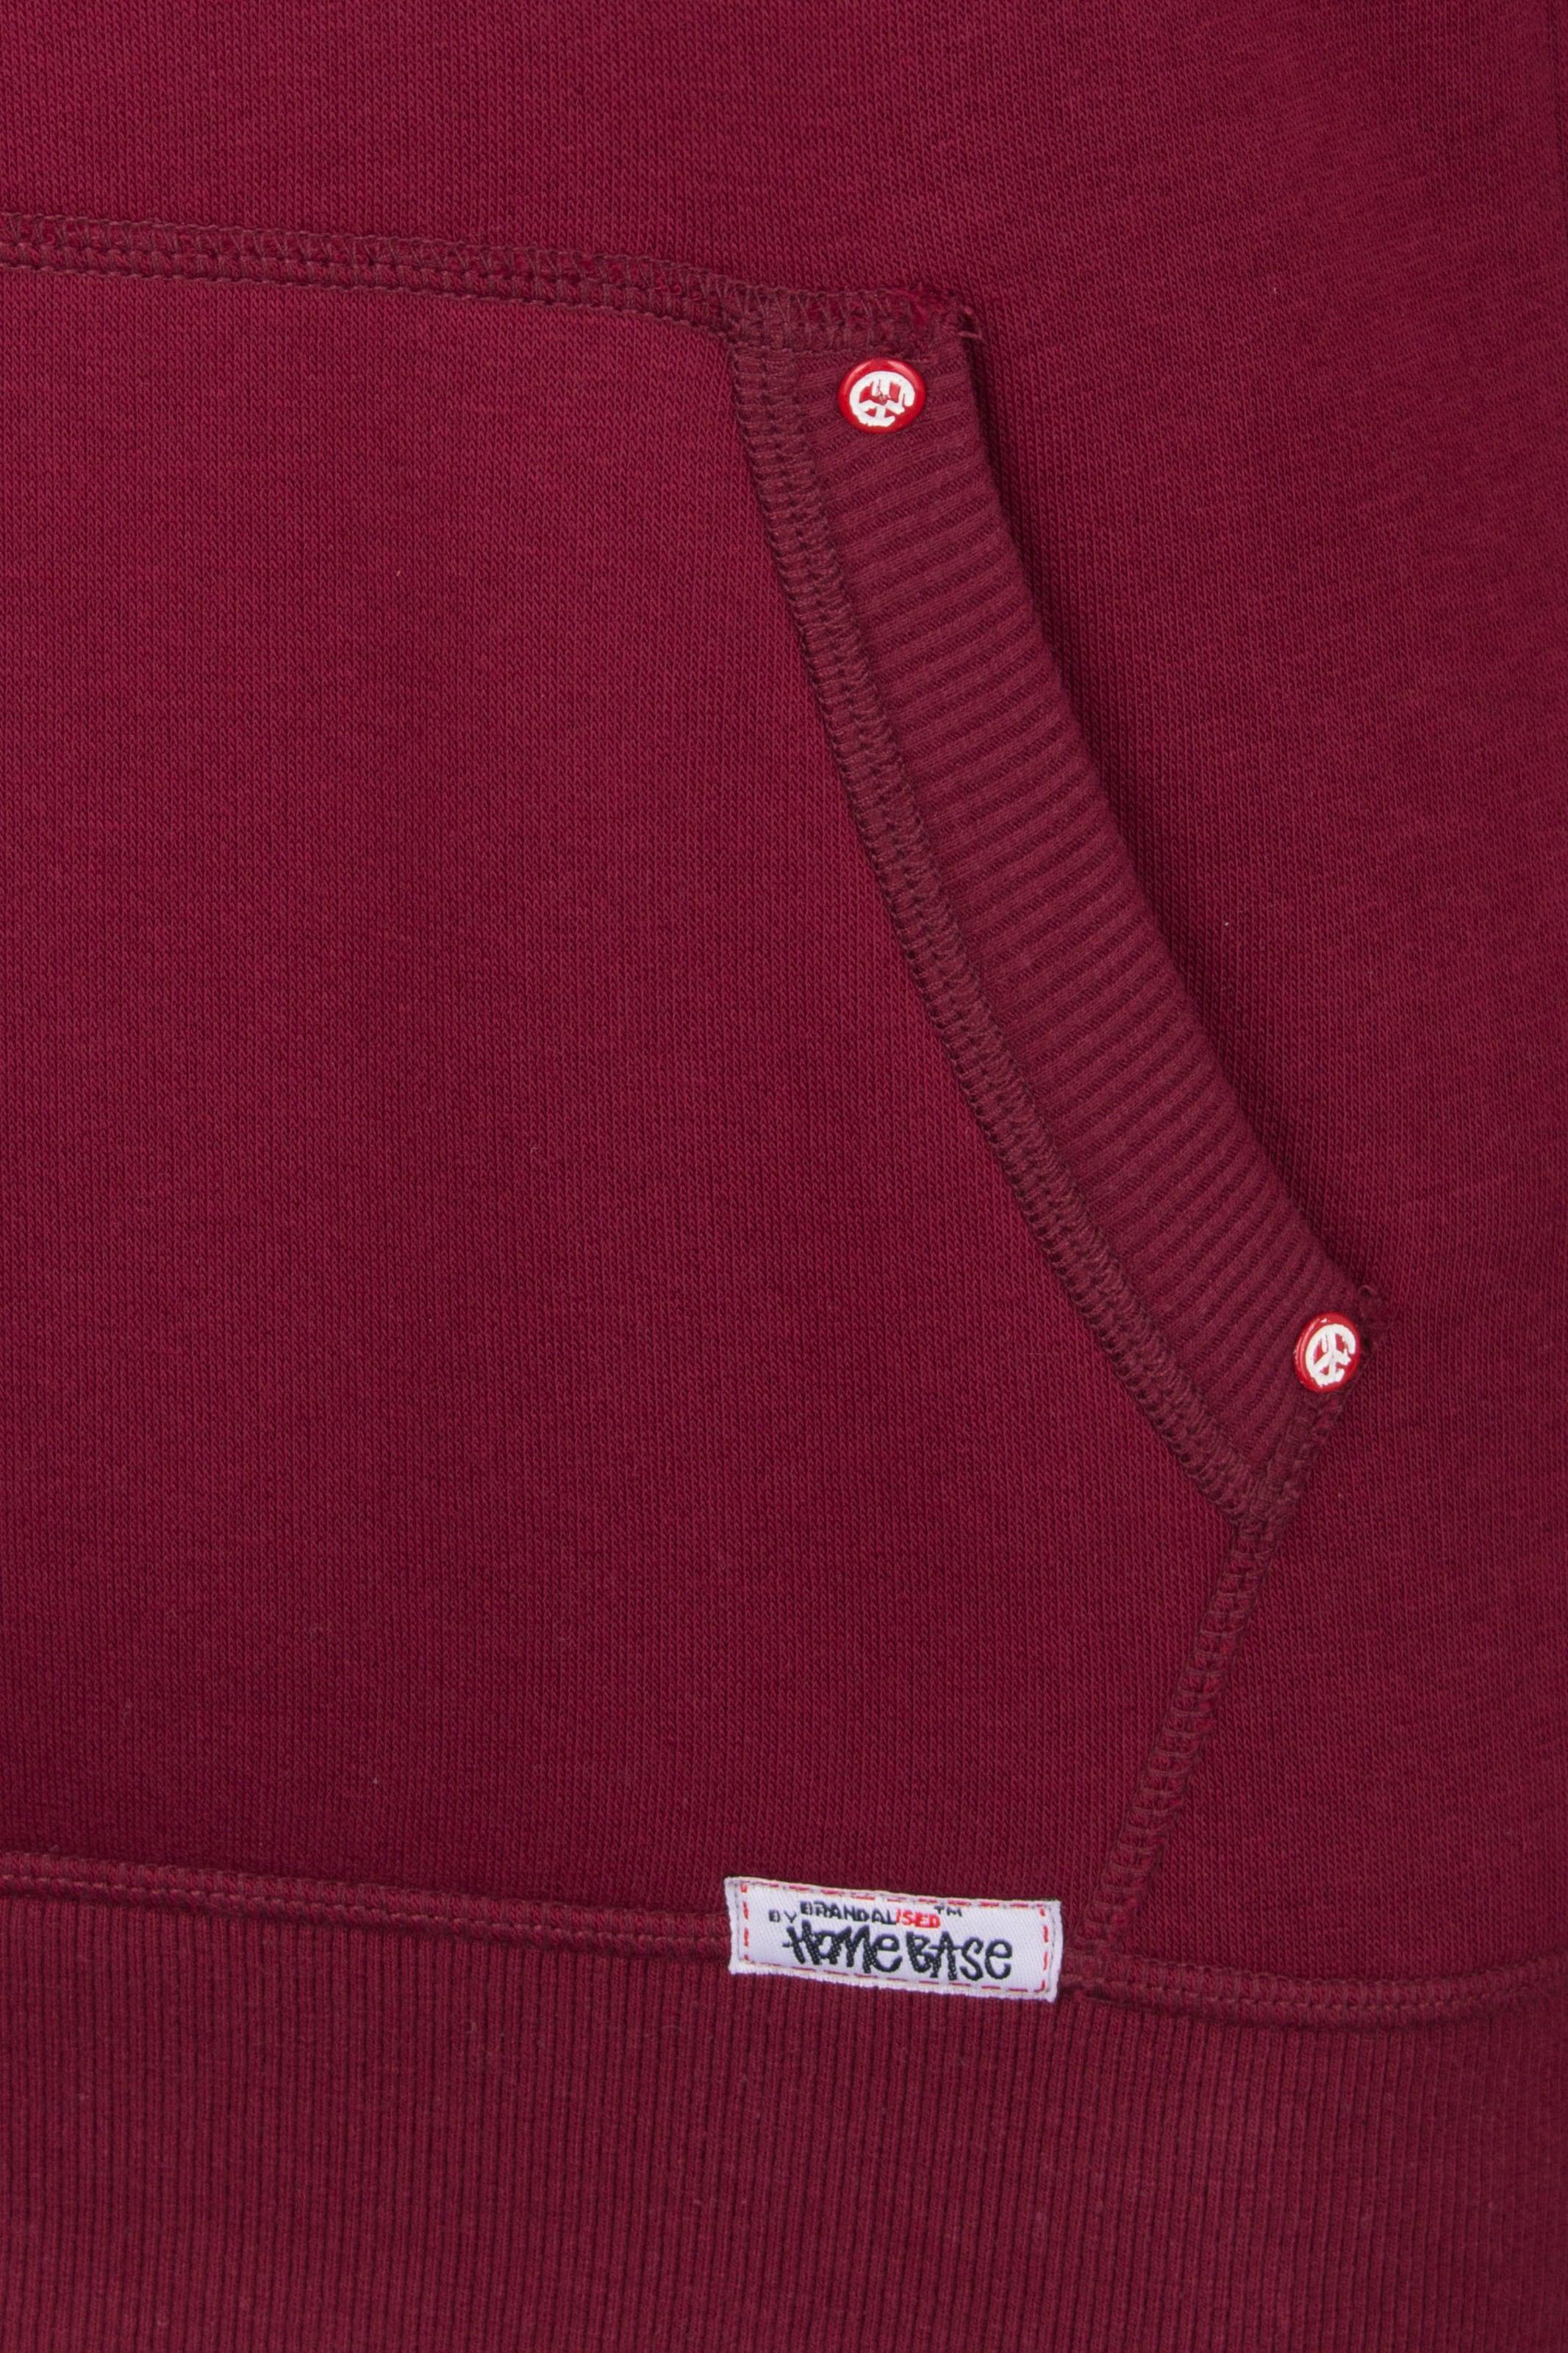 Blanc Sweat En JauneVert Homebase Rouge shirt Gazon RAq35j4L